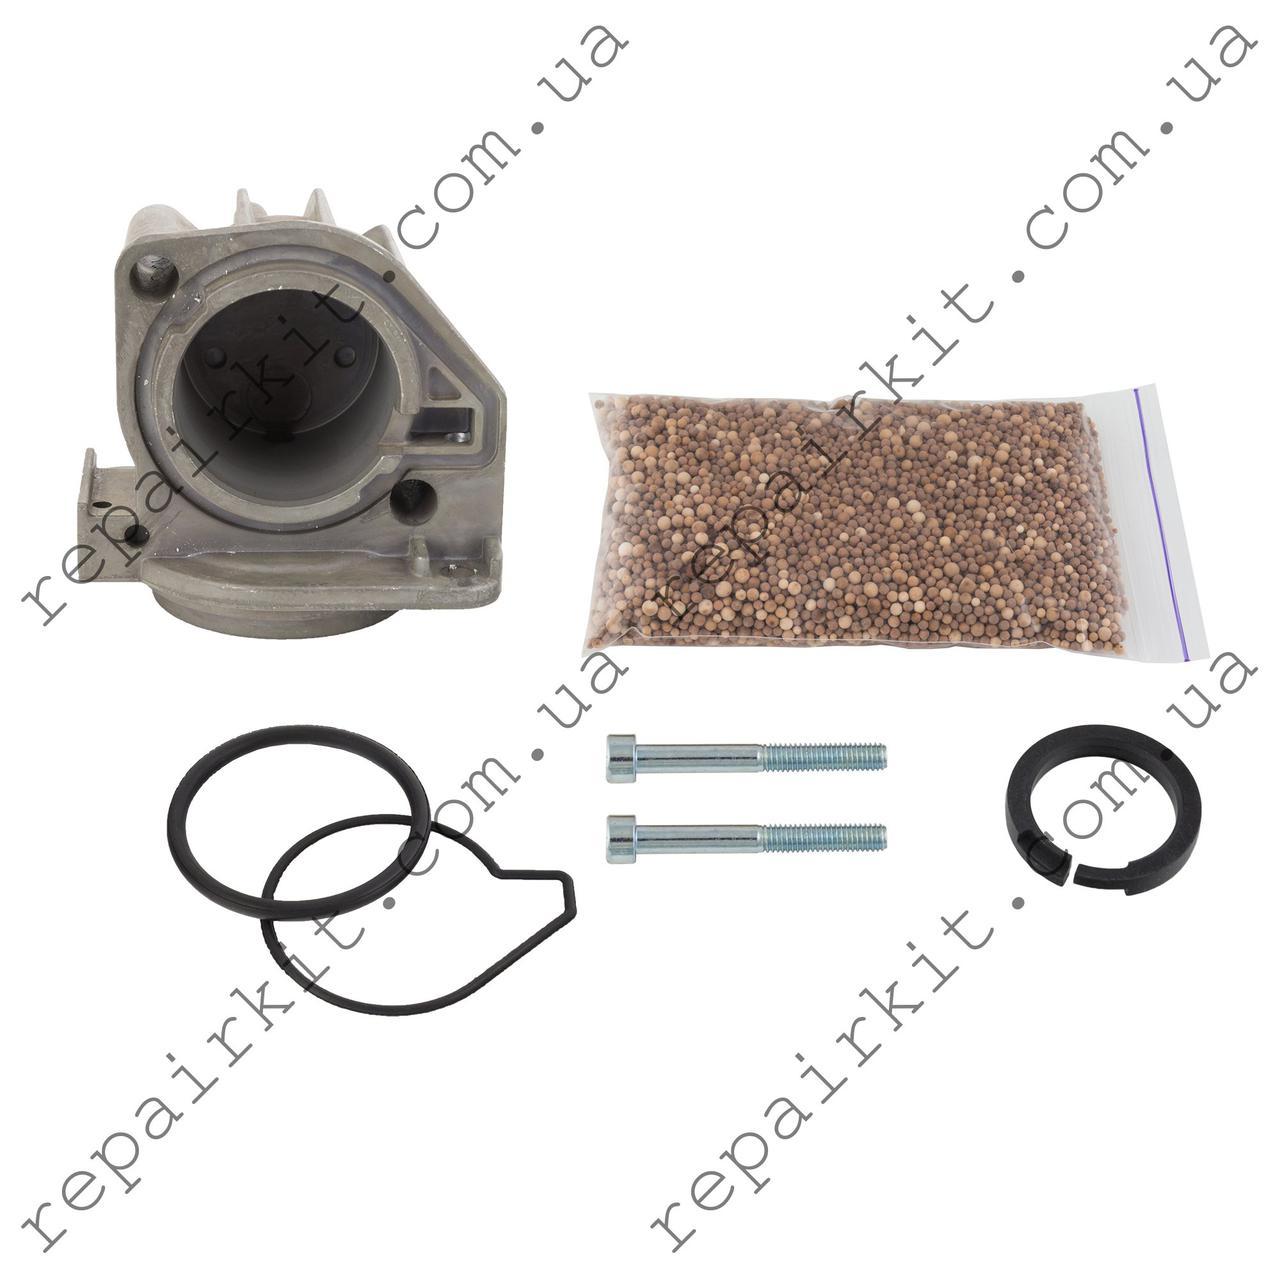 Ремкомплект компрессора пневмоподвески Wabco (тип 3)